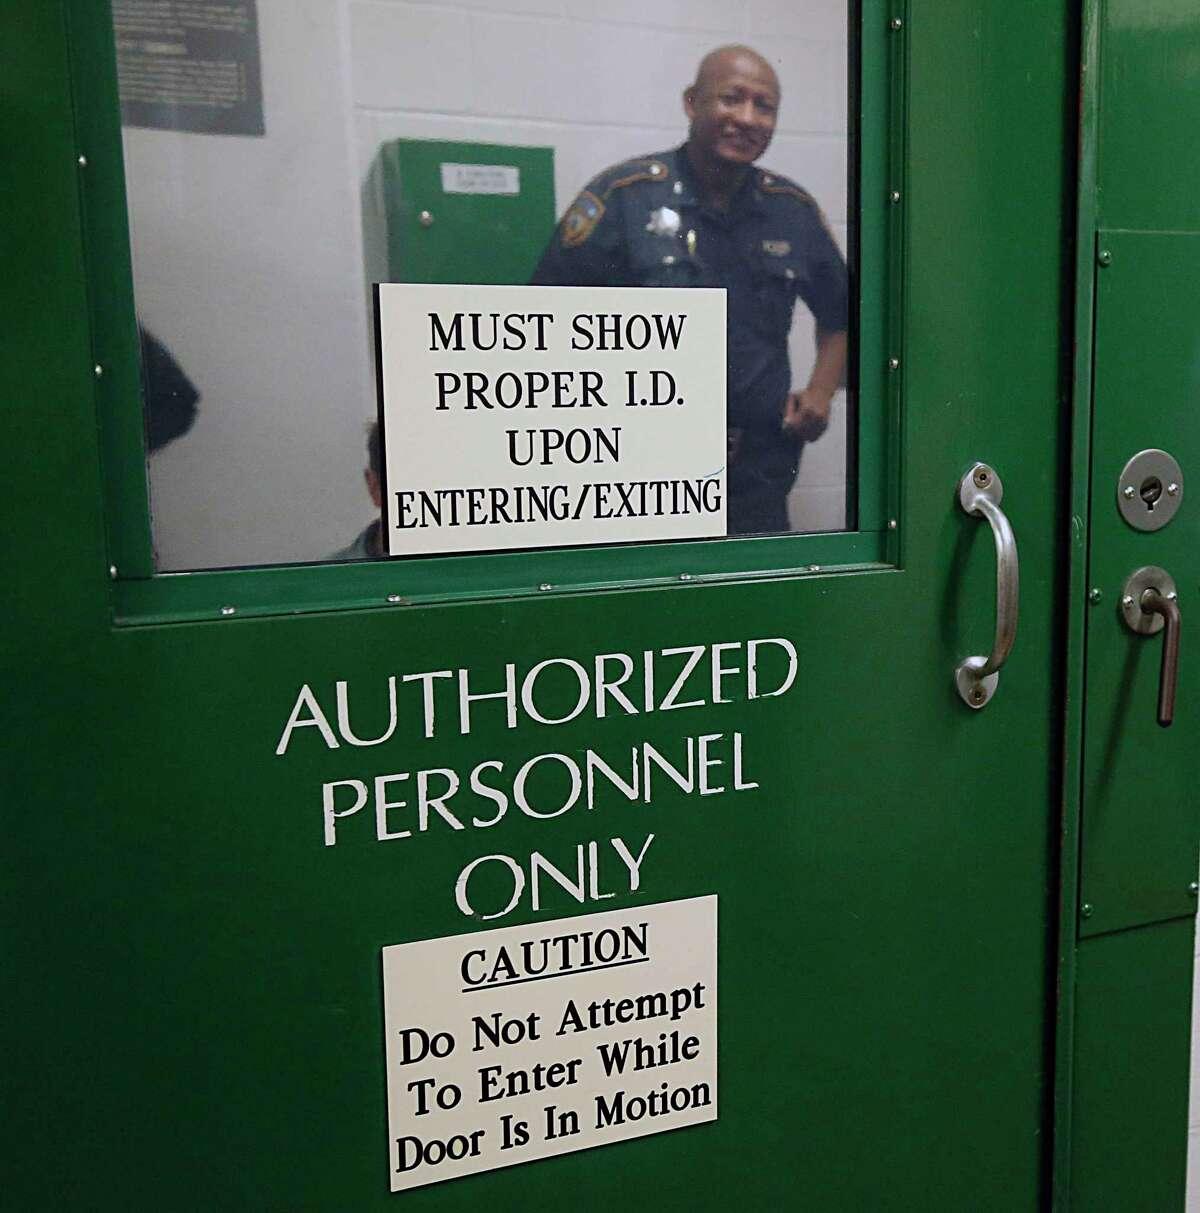 Harris County Sheriff Deputy T.J. Johnson during a tour of the Harris County jail at 1200 Baker street Friday, Sept. 25, 2015, in Houston. ( James Nielsen / Houston Chronicle )